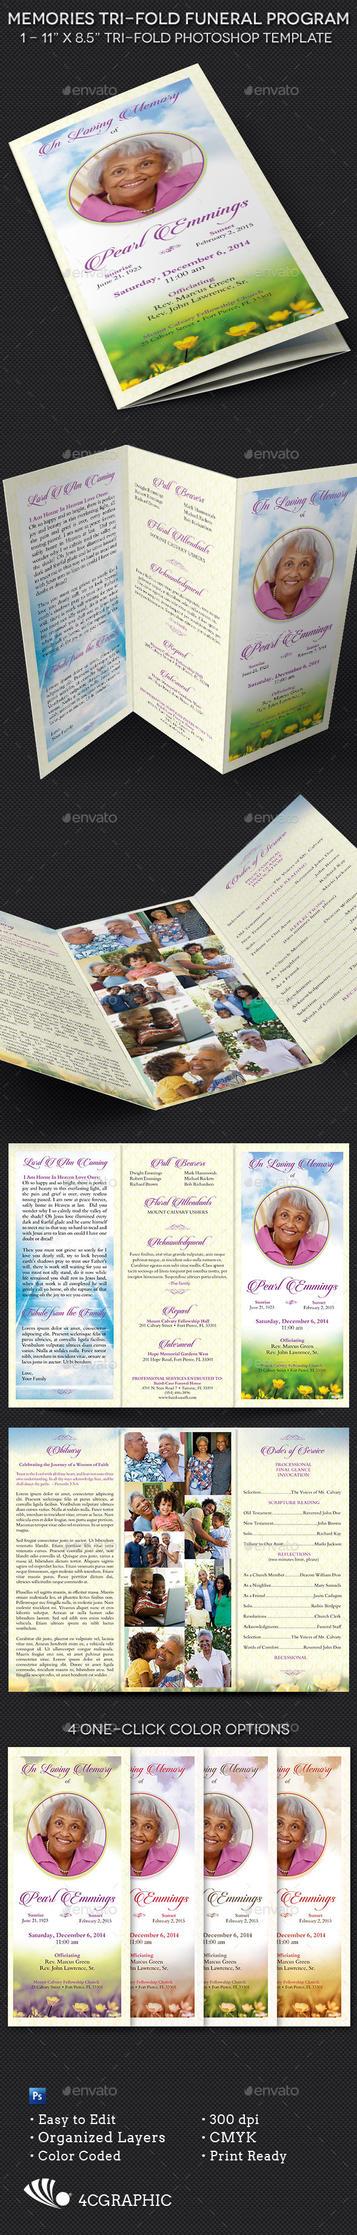 Memories Tri-fold Funeral Program Template by Godserv